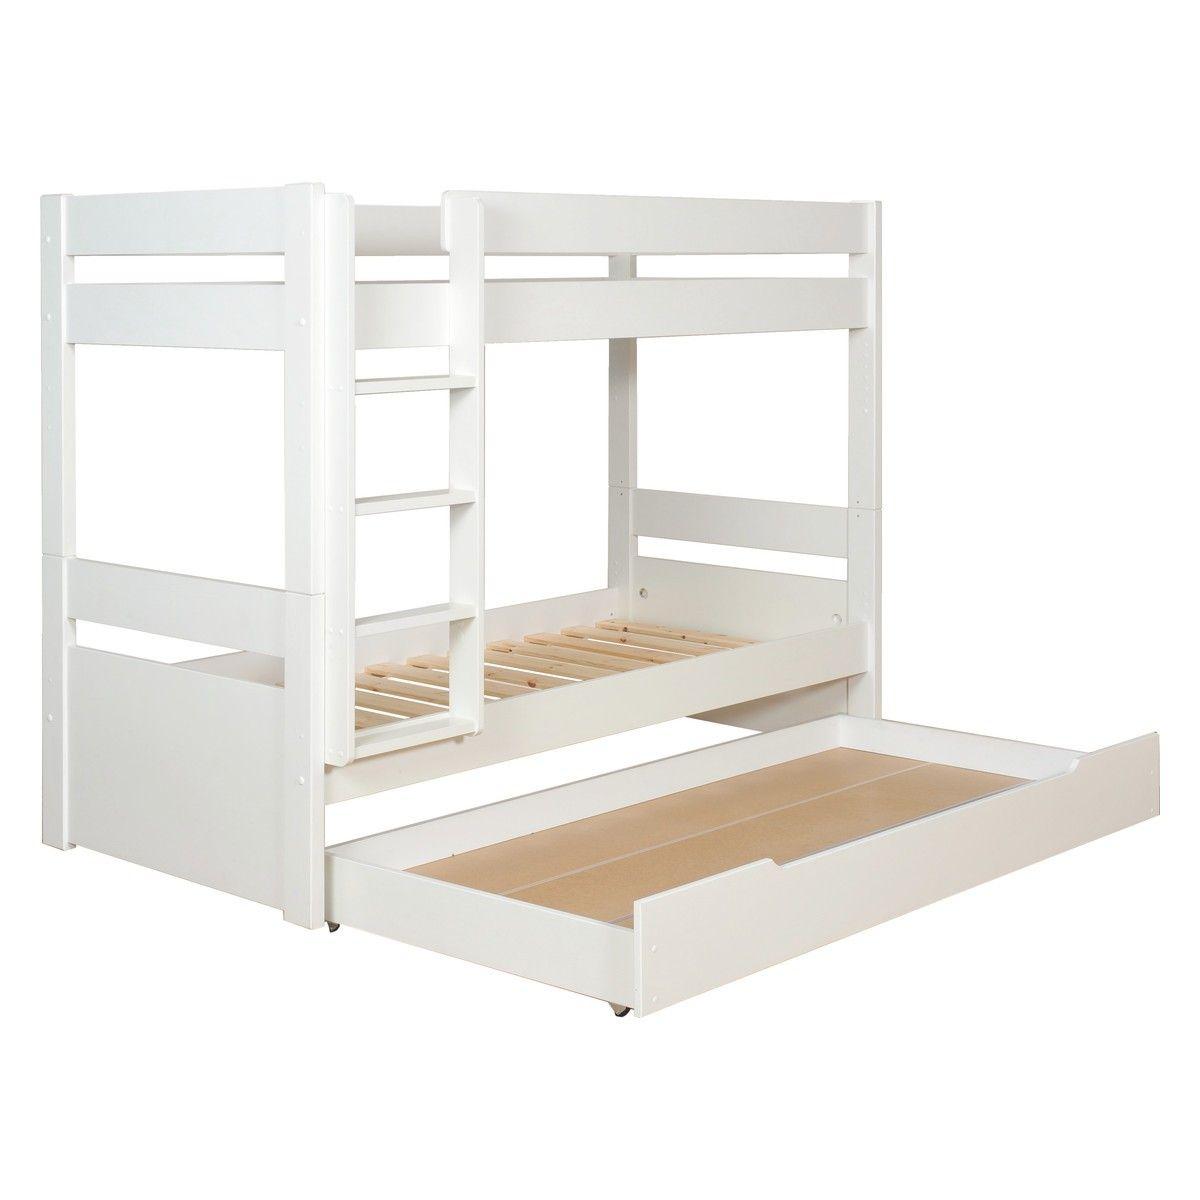 PONGO Kids white EU single detachable bunk bed with storage Bunk